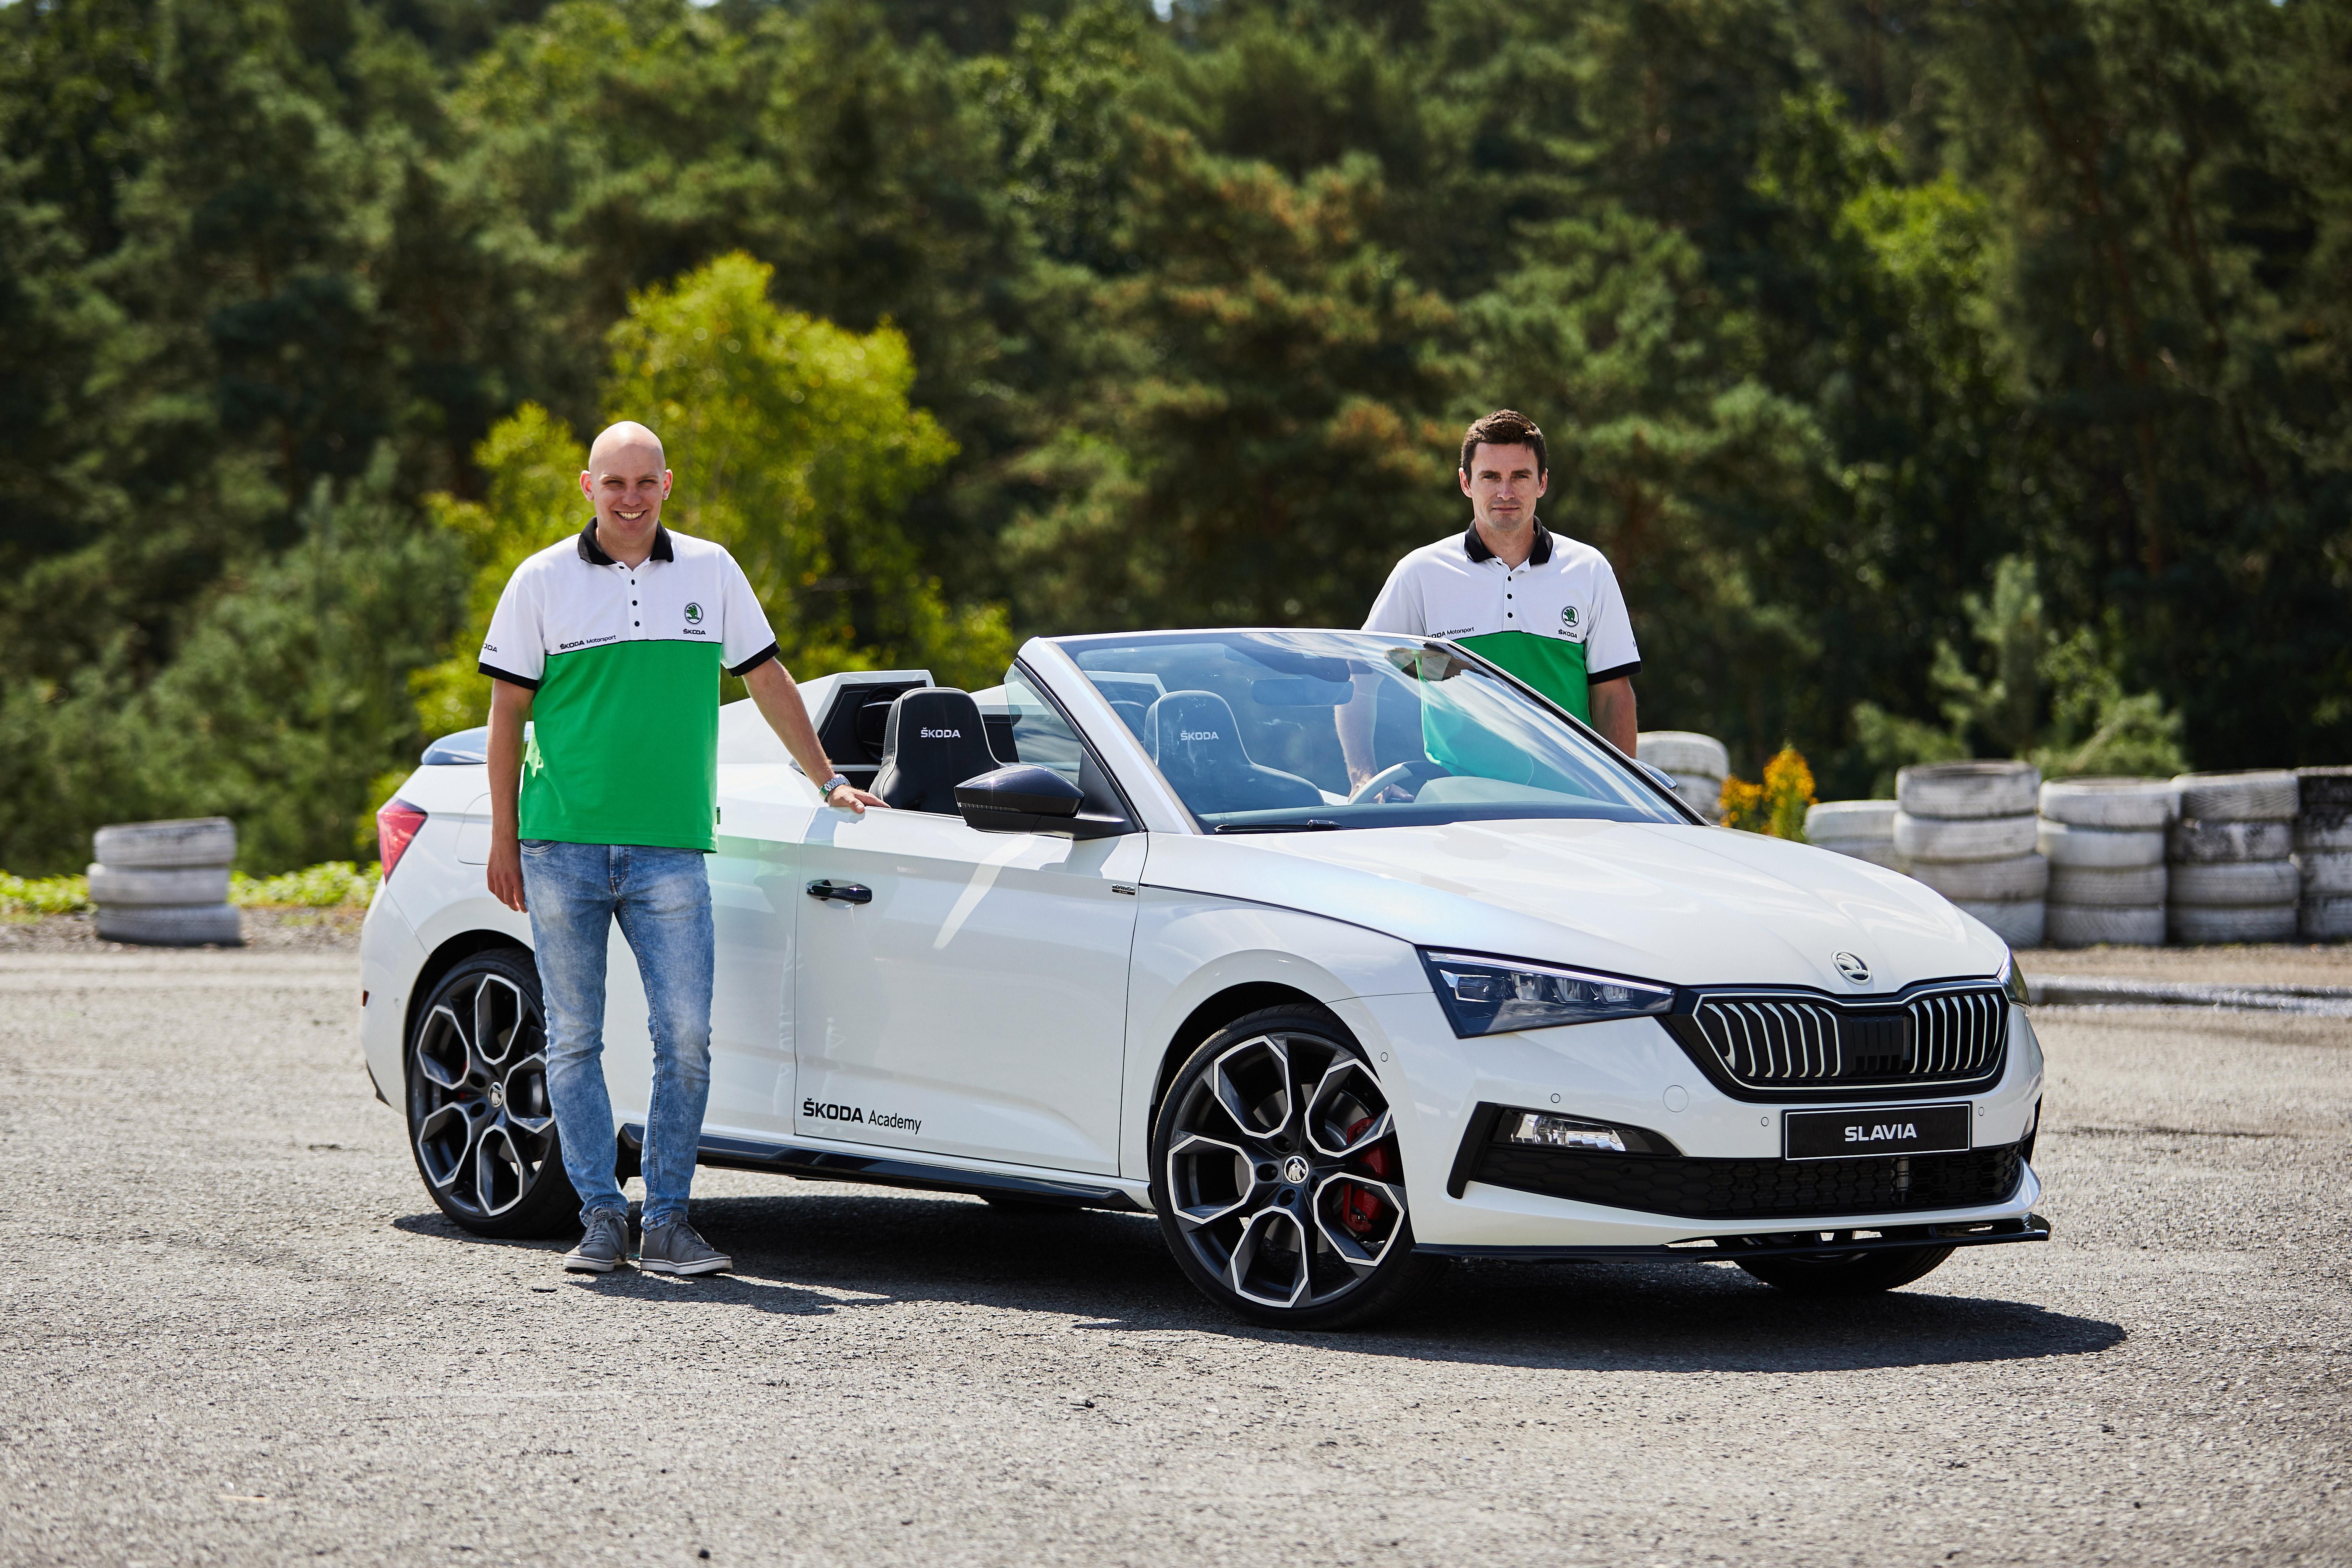 SKODA SLAVIA endurance test: Student Car 2020 impresses rally professionals Jan Kopecký and Jan Hlousek - Image 1